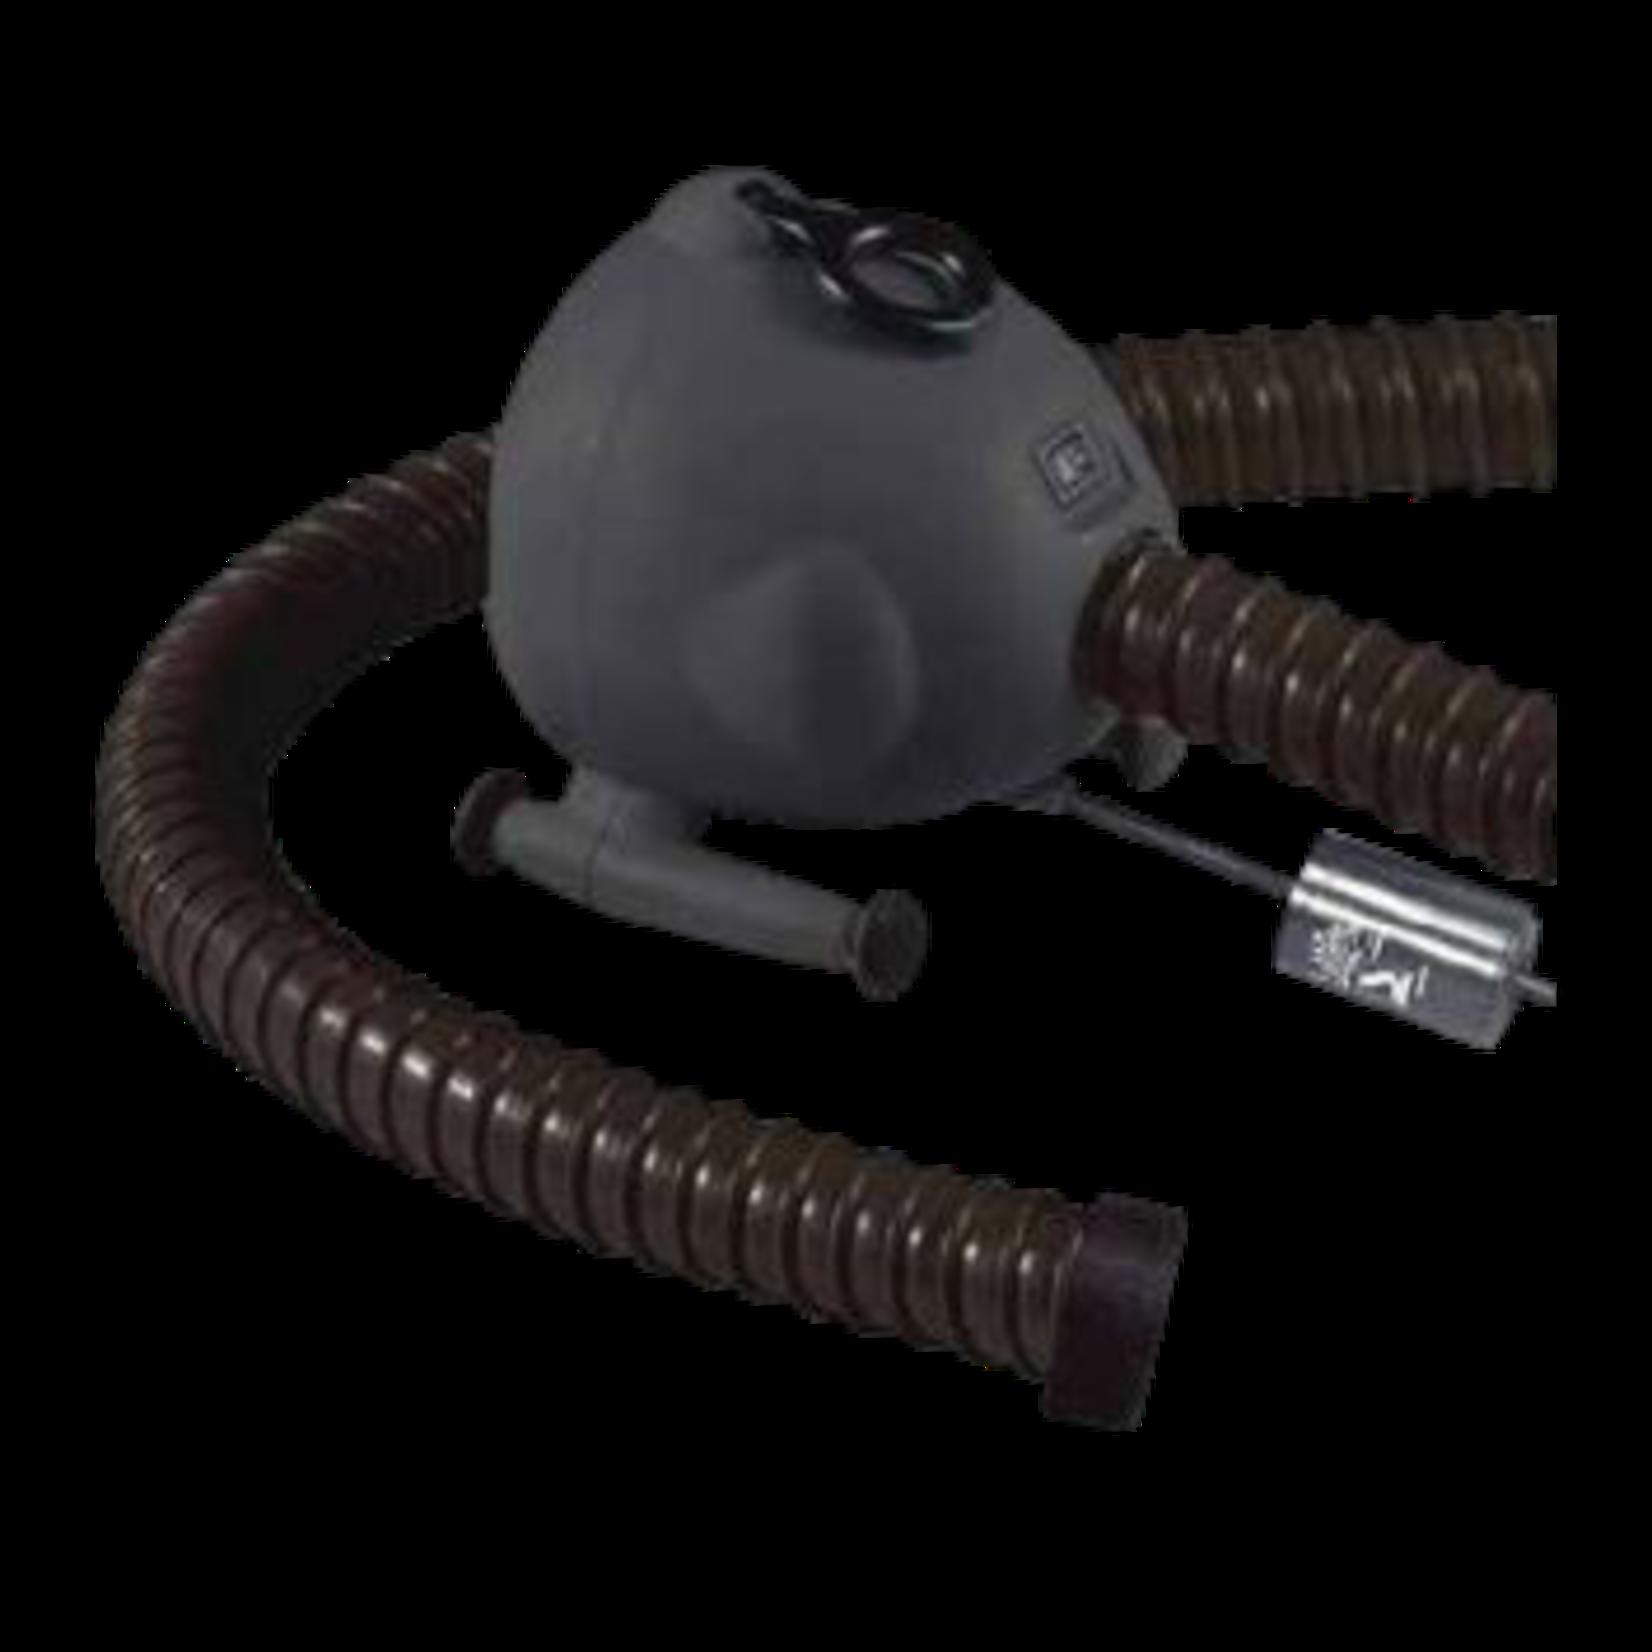 Scoprega Electric pump 230V - up to 250 mbar